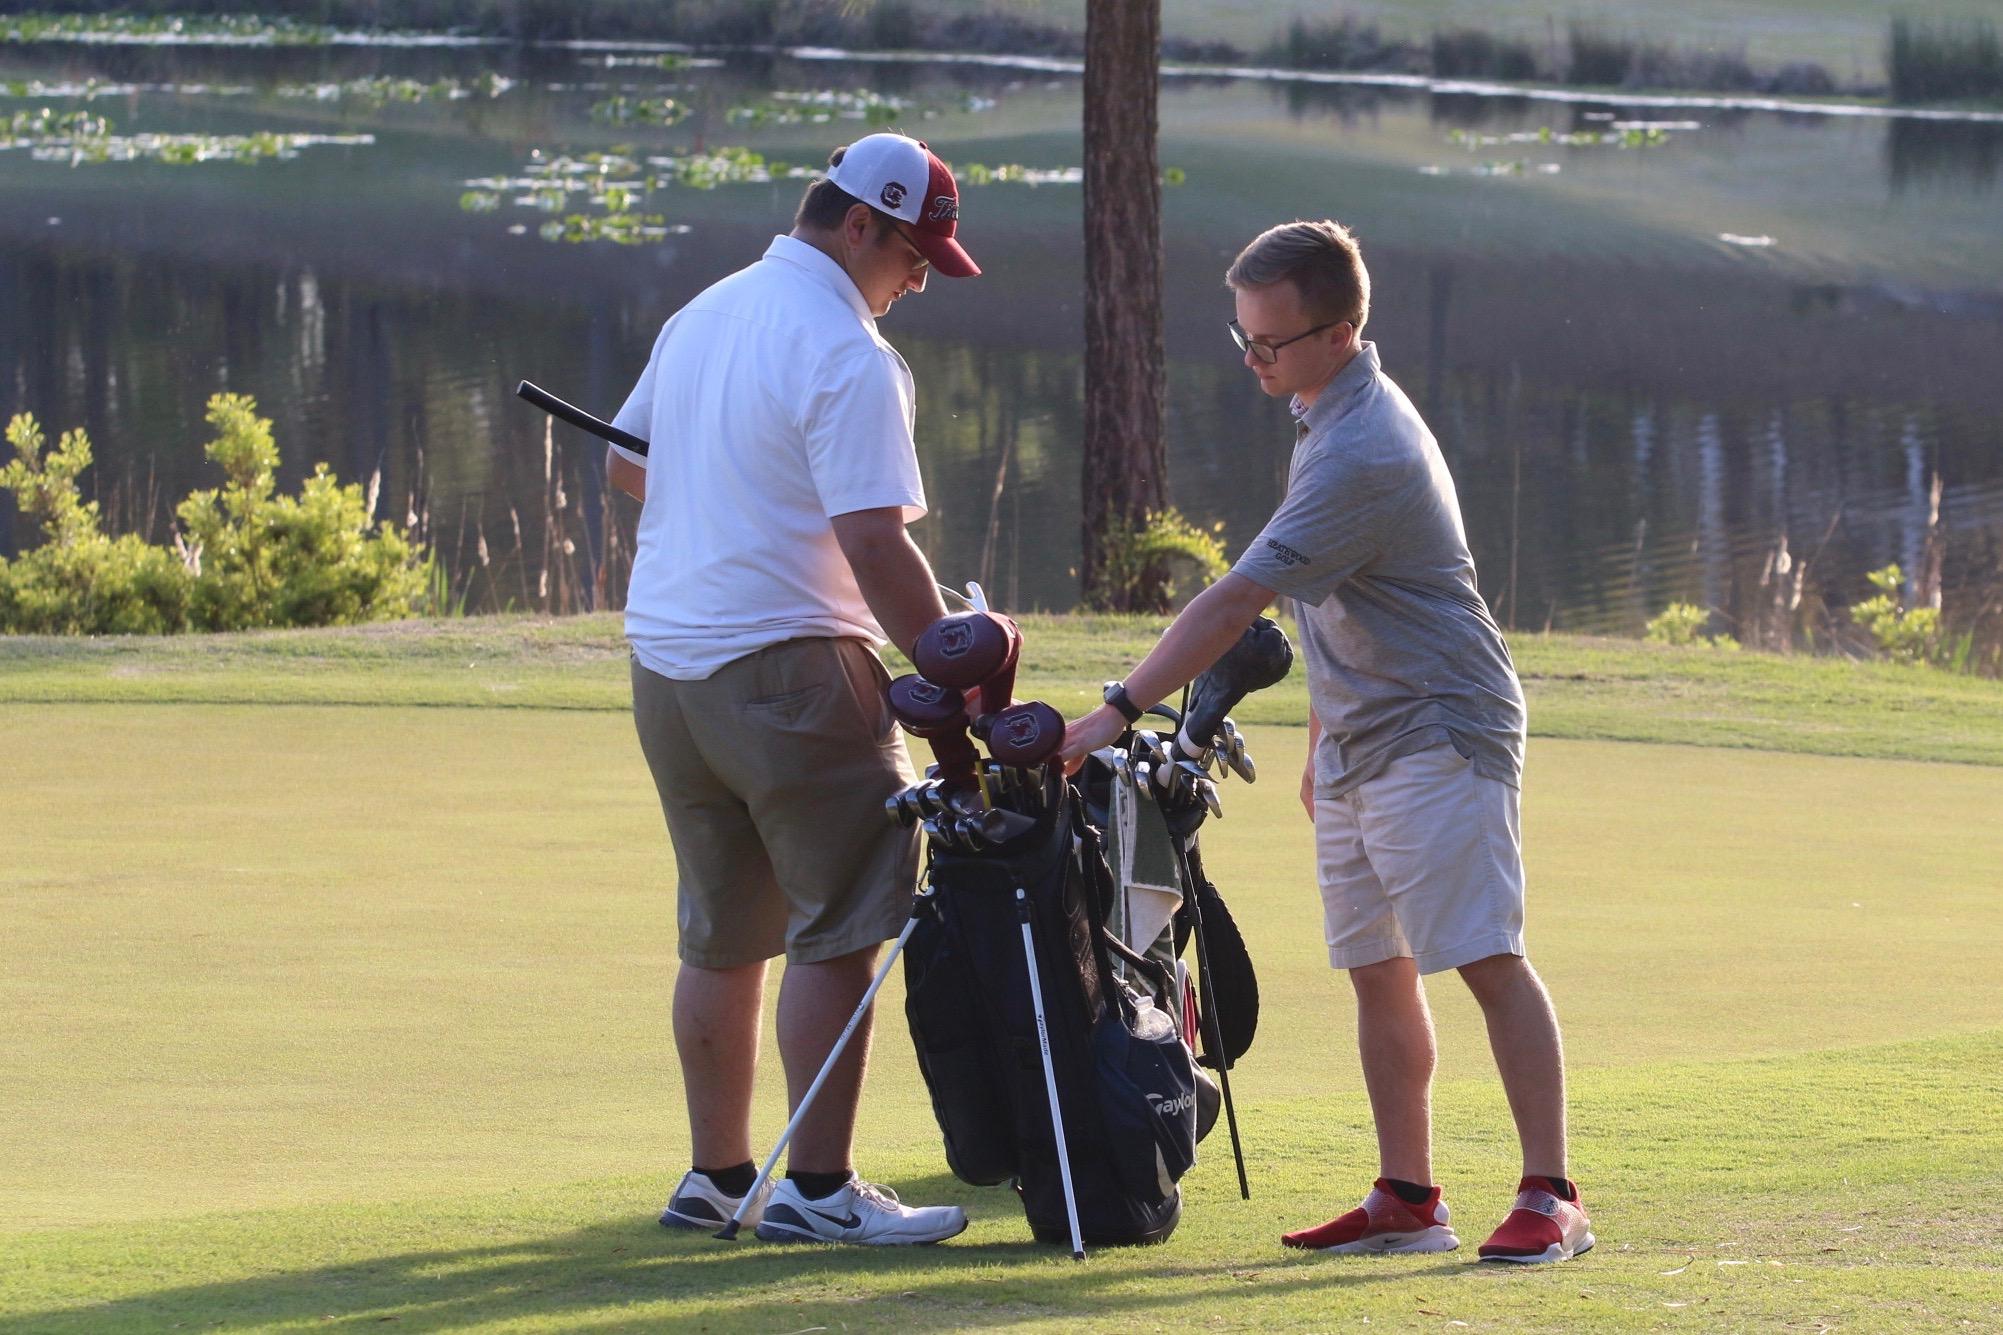 2018 Highlander Boys Golf: All In The Family